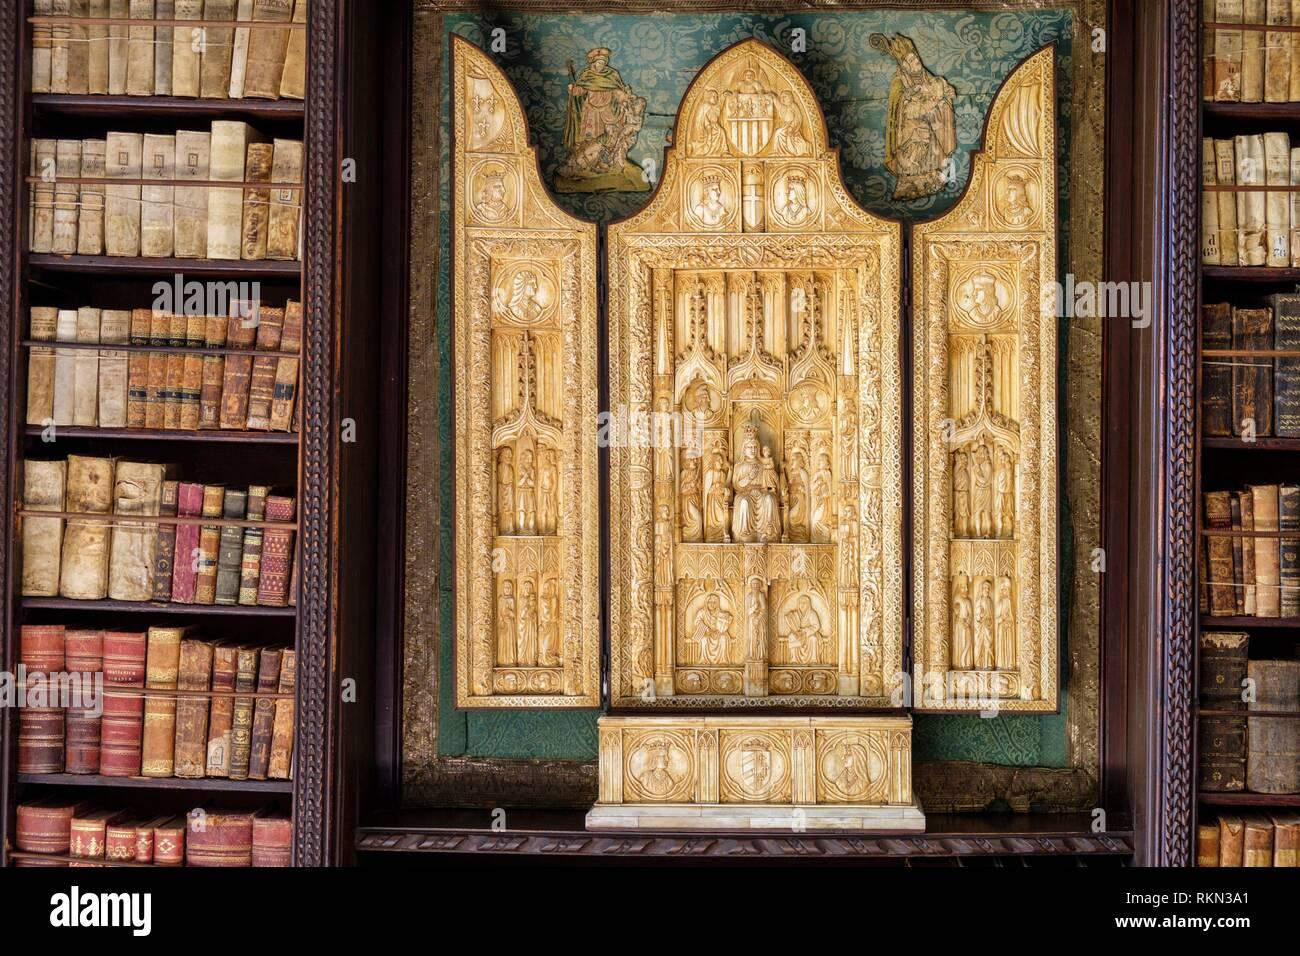 tríptico gotico de marfil ,siglo XV , representa la boda de María de Montpellier y Pedro II de Aragón, Valldemossa, Mallorca, balearic islands, Spain. Stock Photo